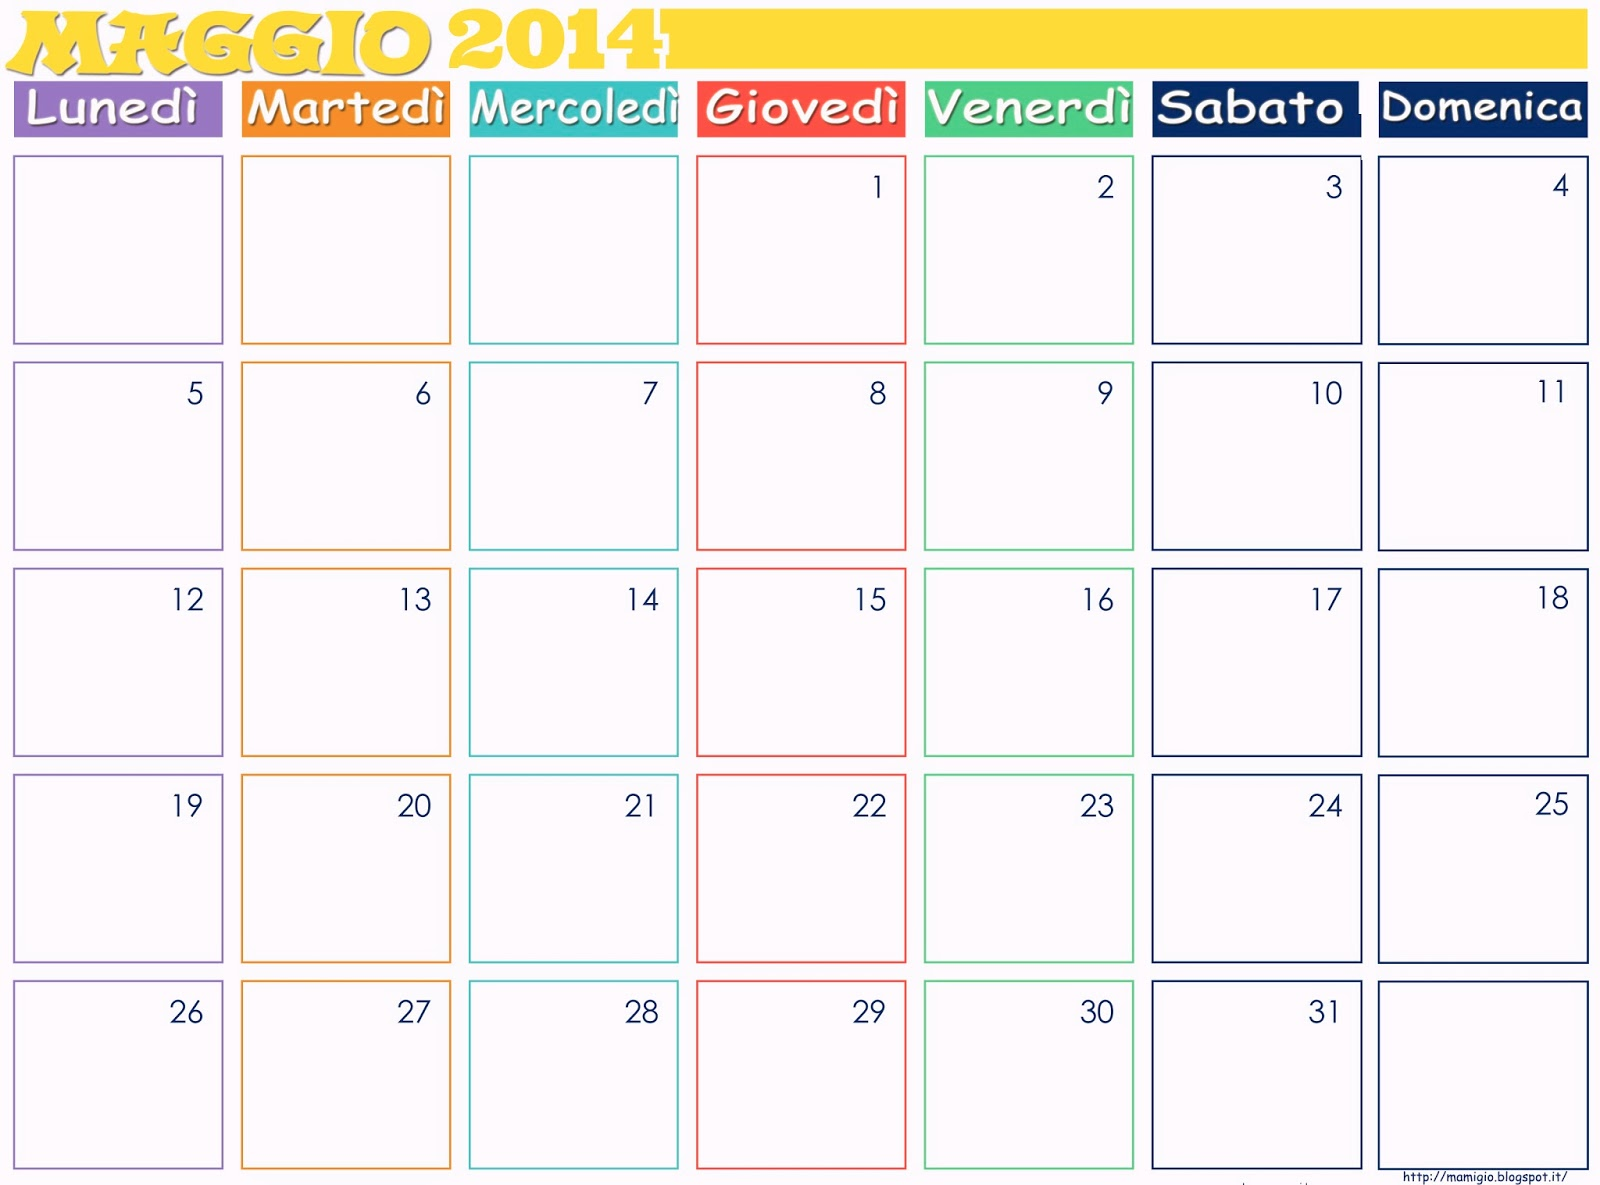 Mamigio calendario mensile scaricabile - Calendario da tavolo 2017 ...